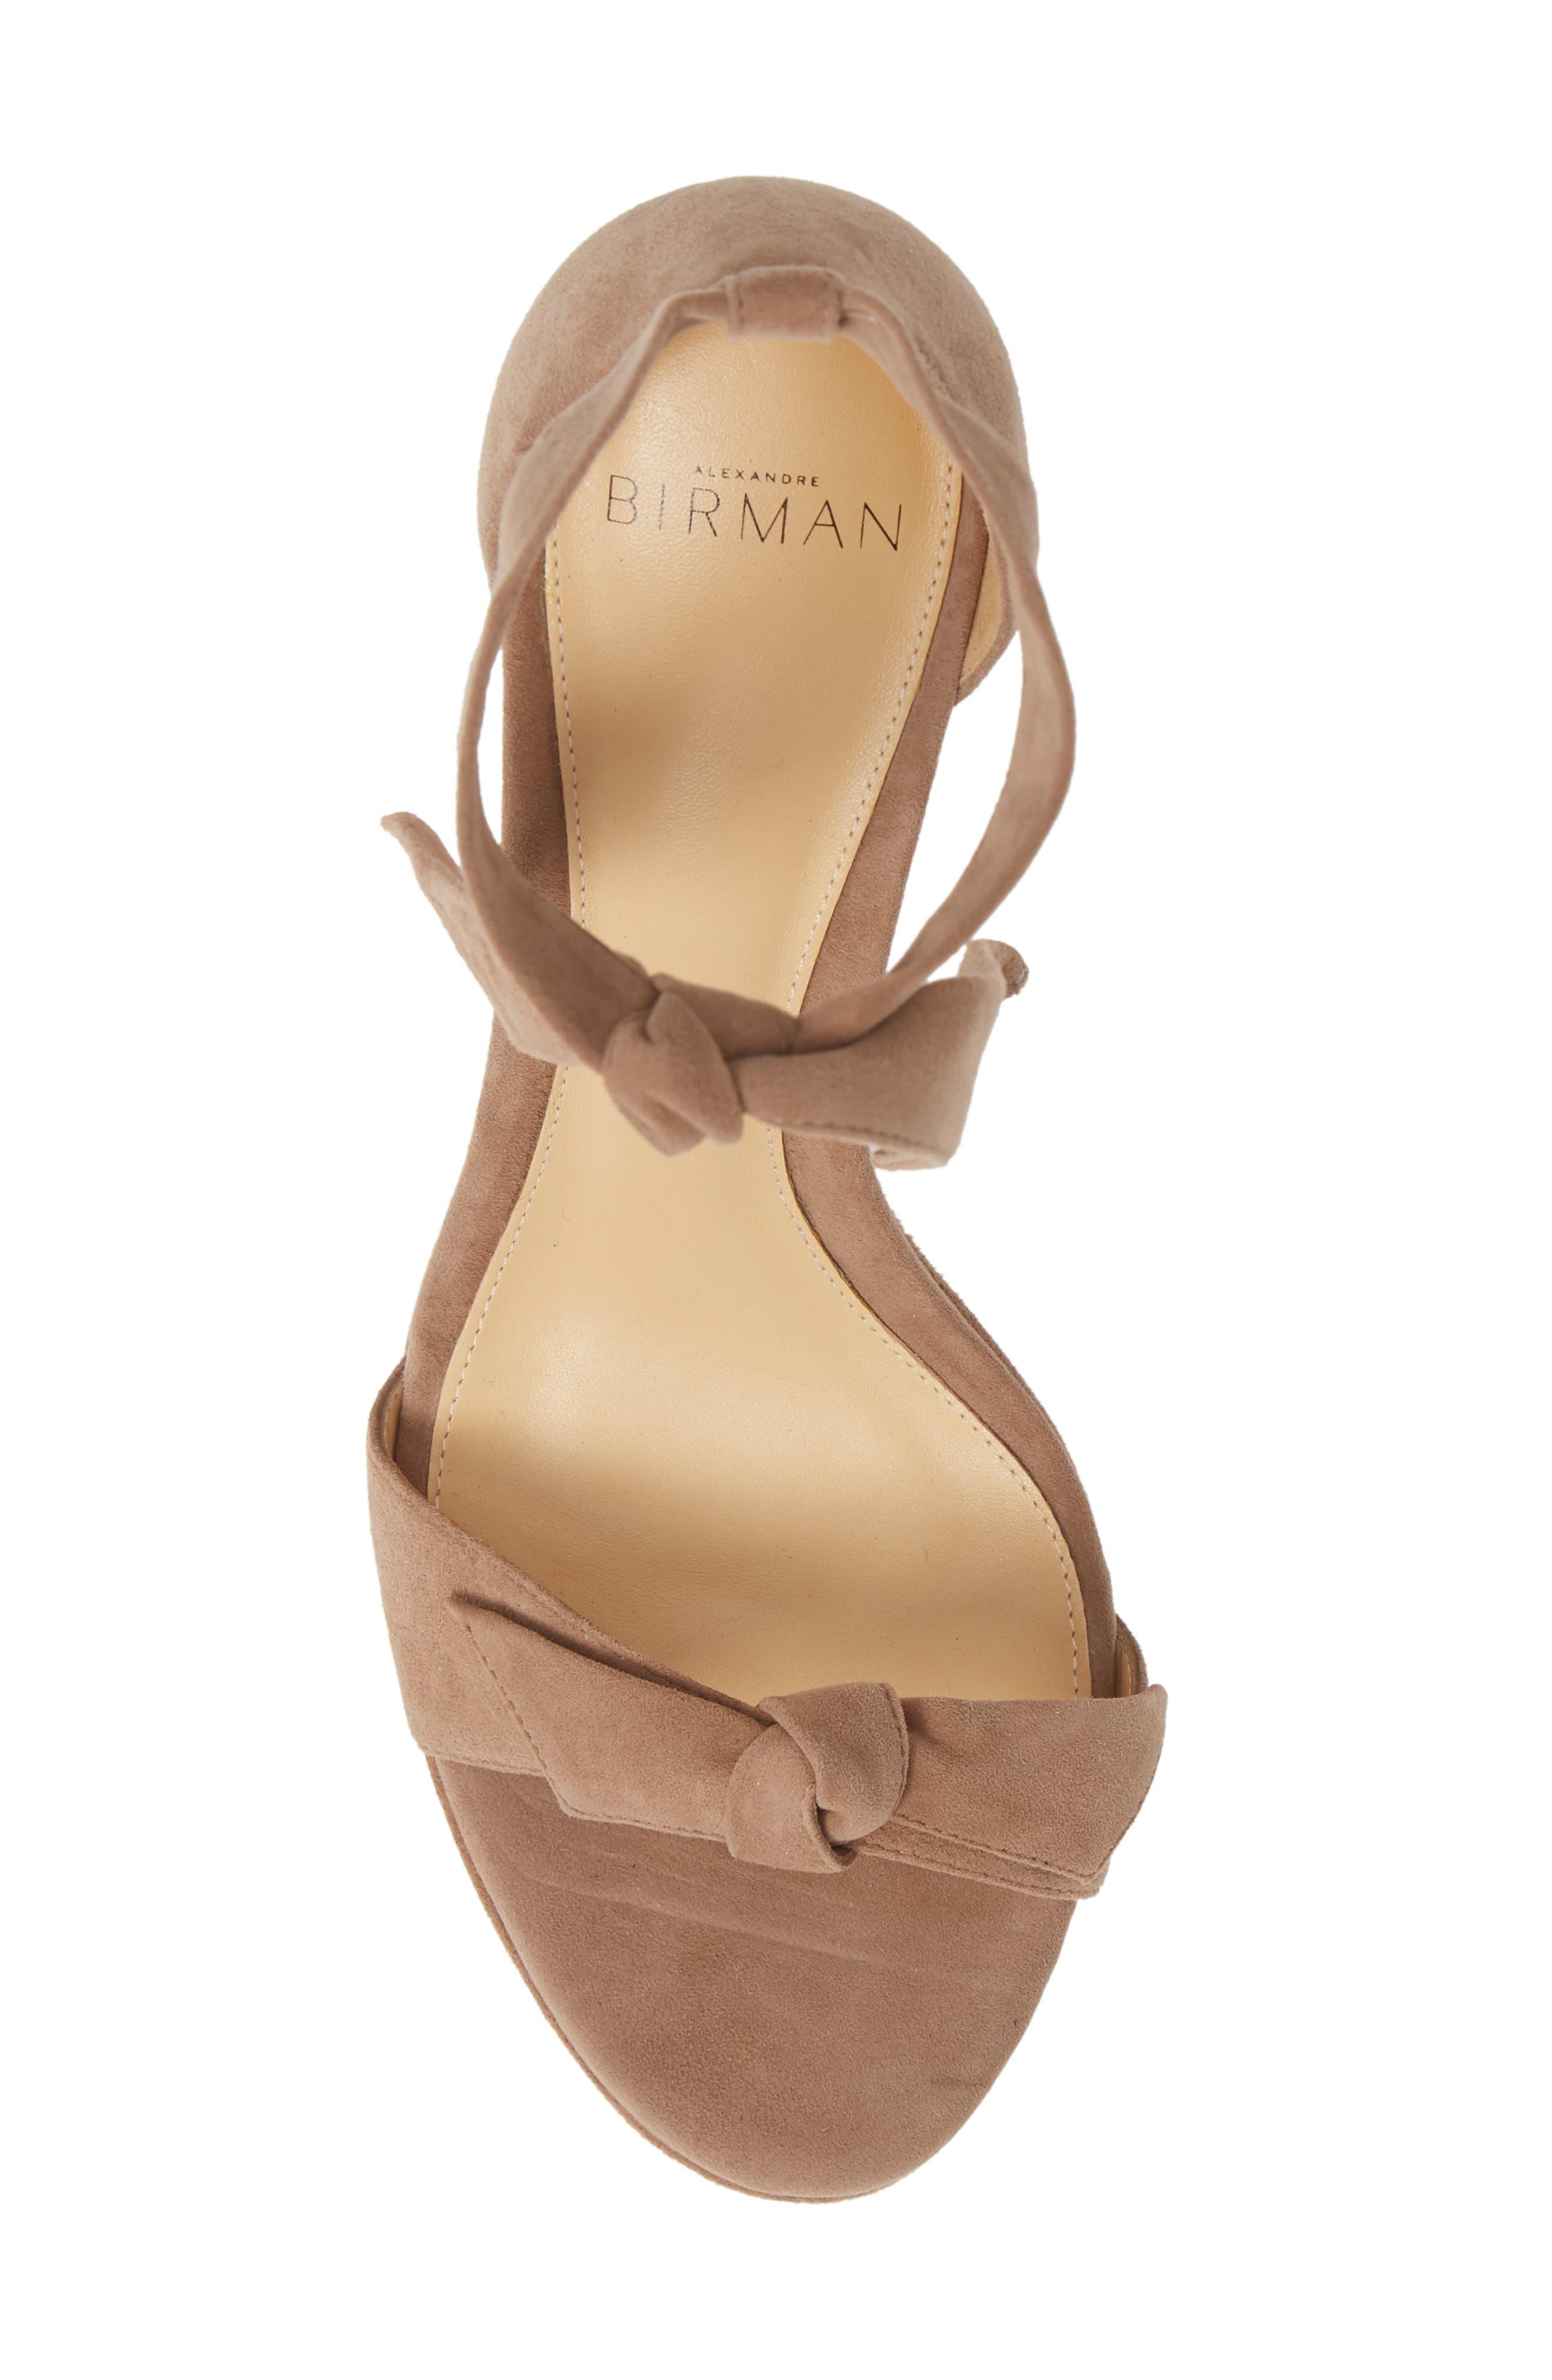 Clarita Platform Wedge Sandal,                             Alternate thumbnail 5, color,                             CAMEO SUEDE